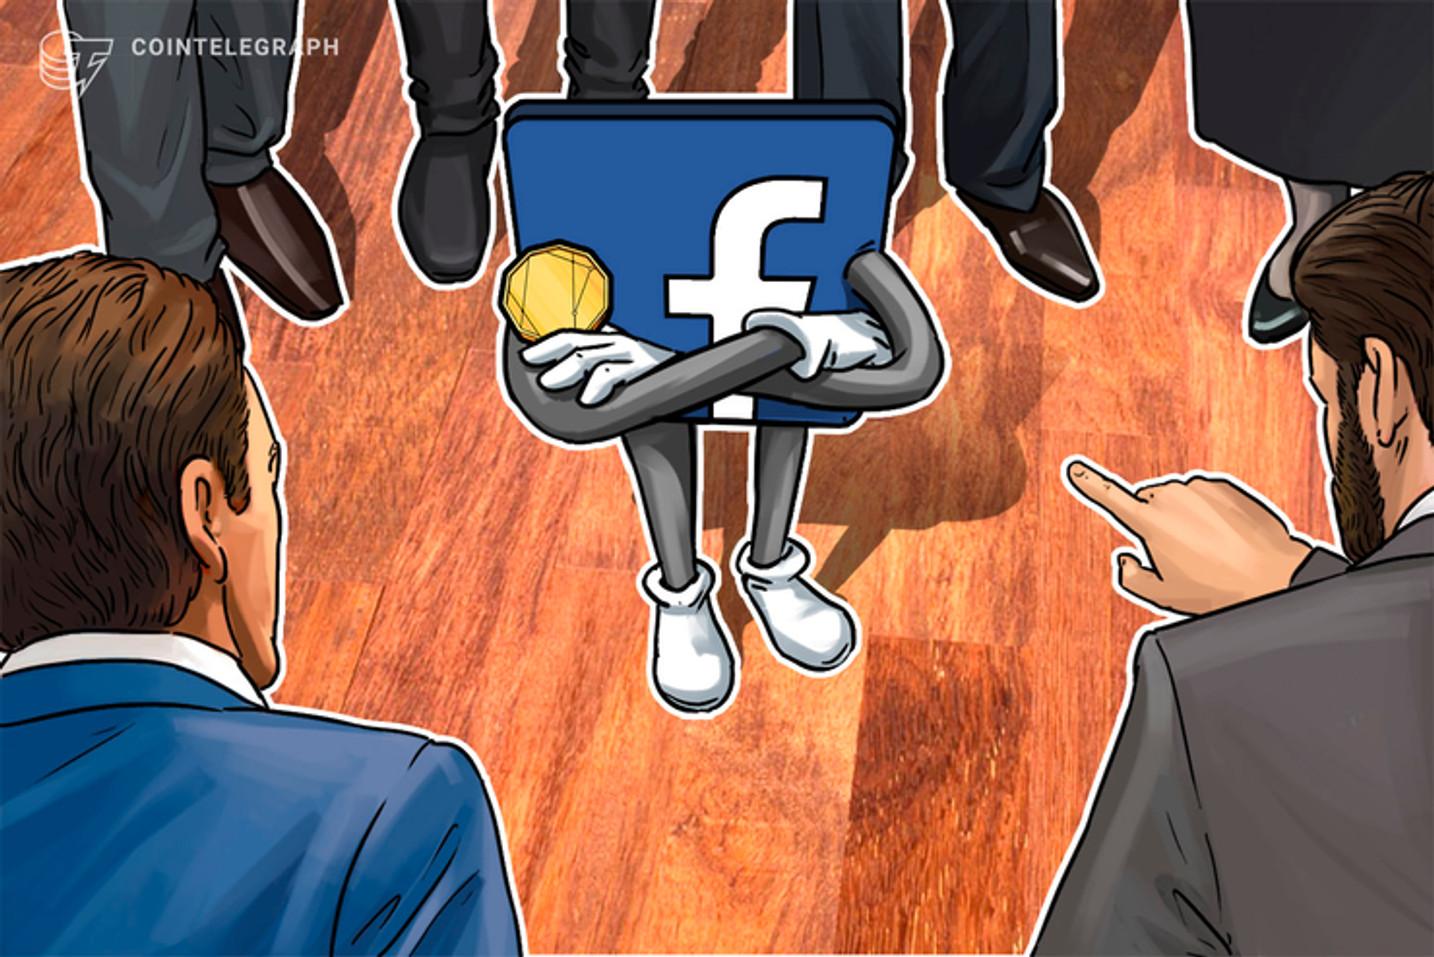 Facebook é processado por suposto plágio no logotipo de wallet do projeto Libra